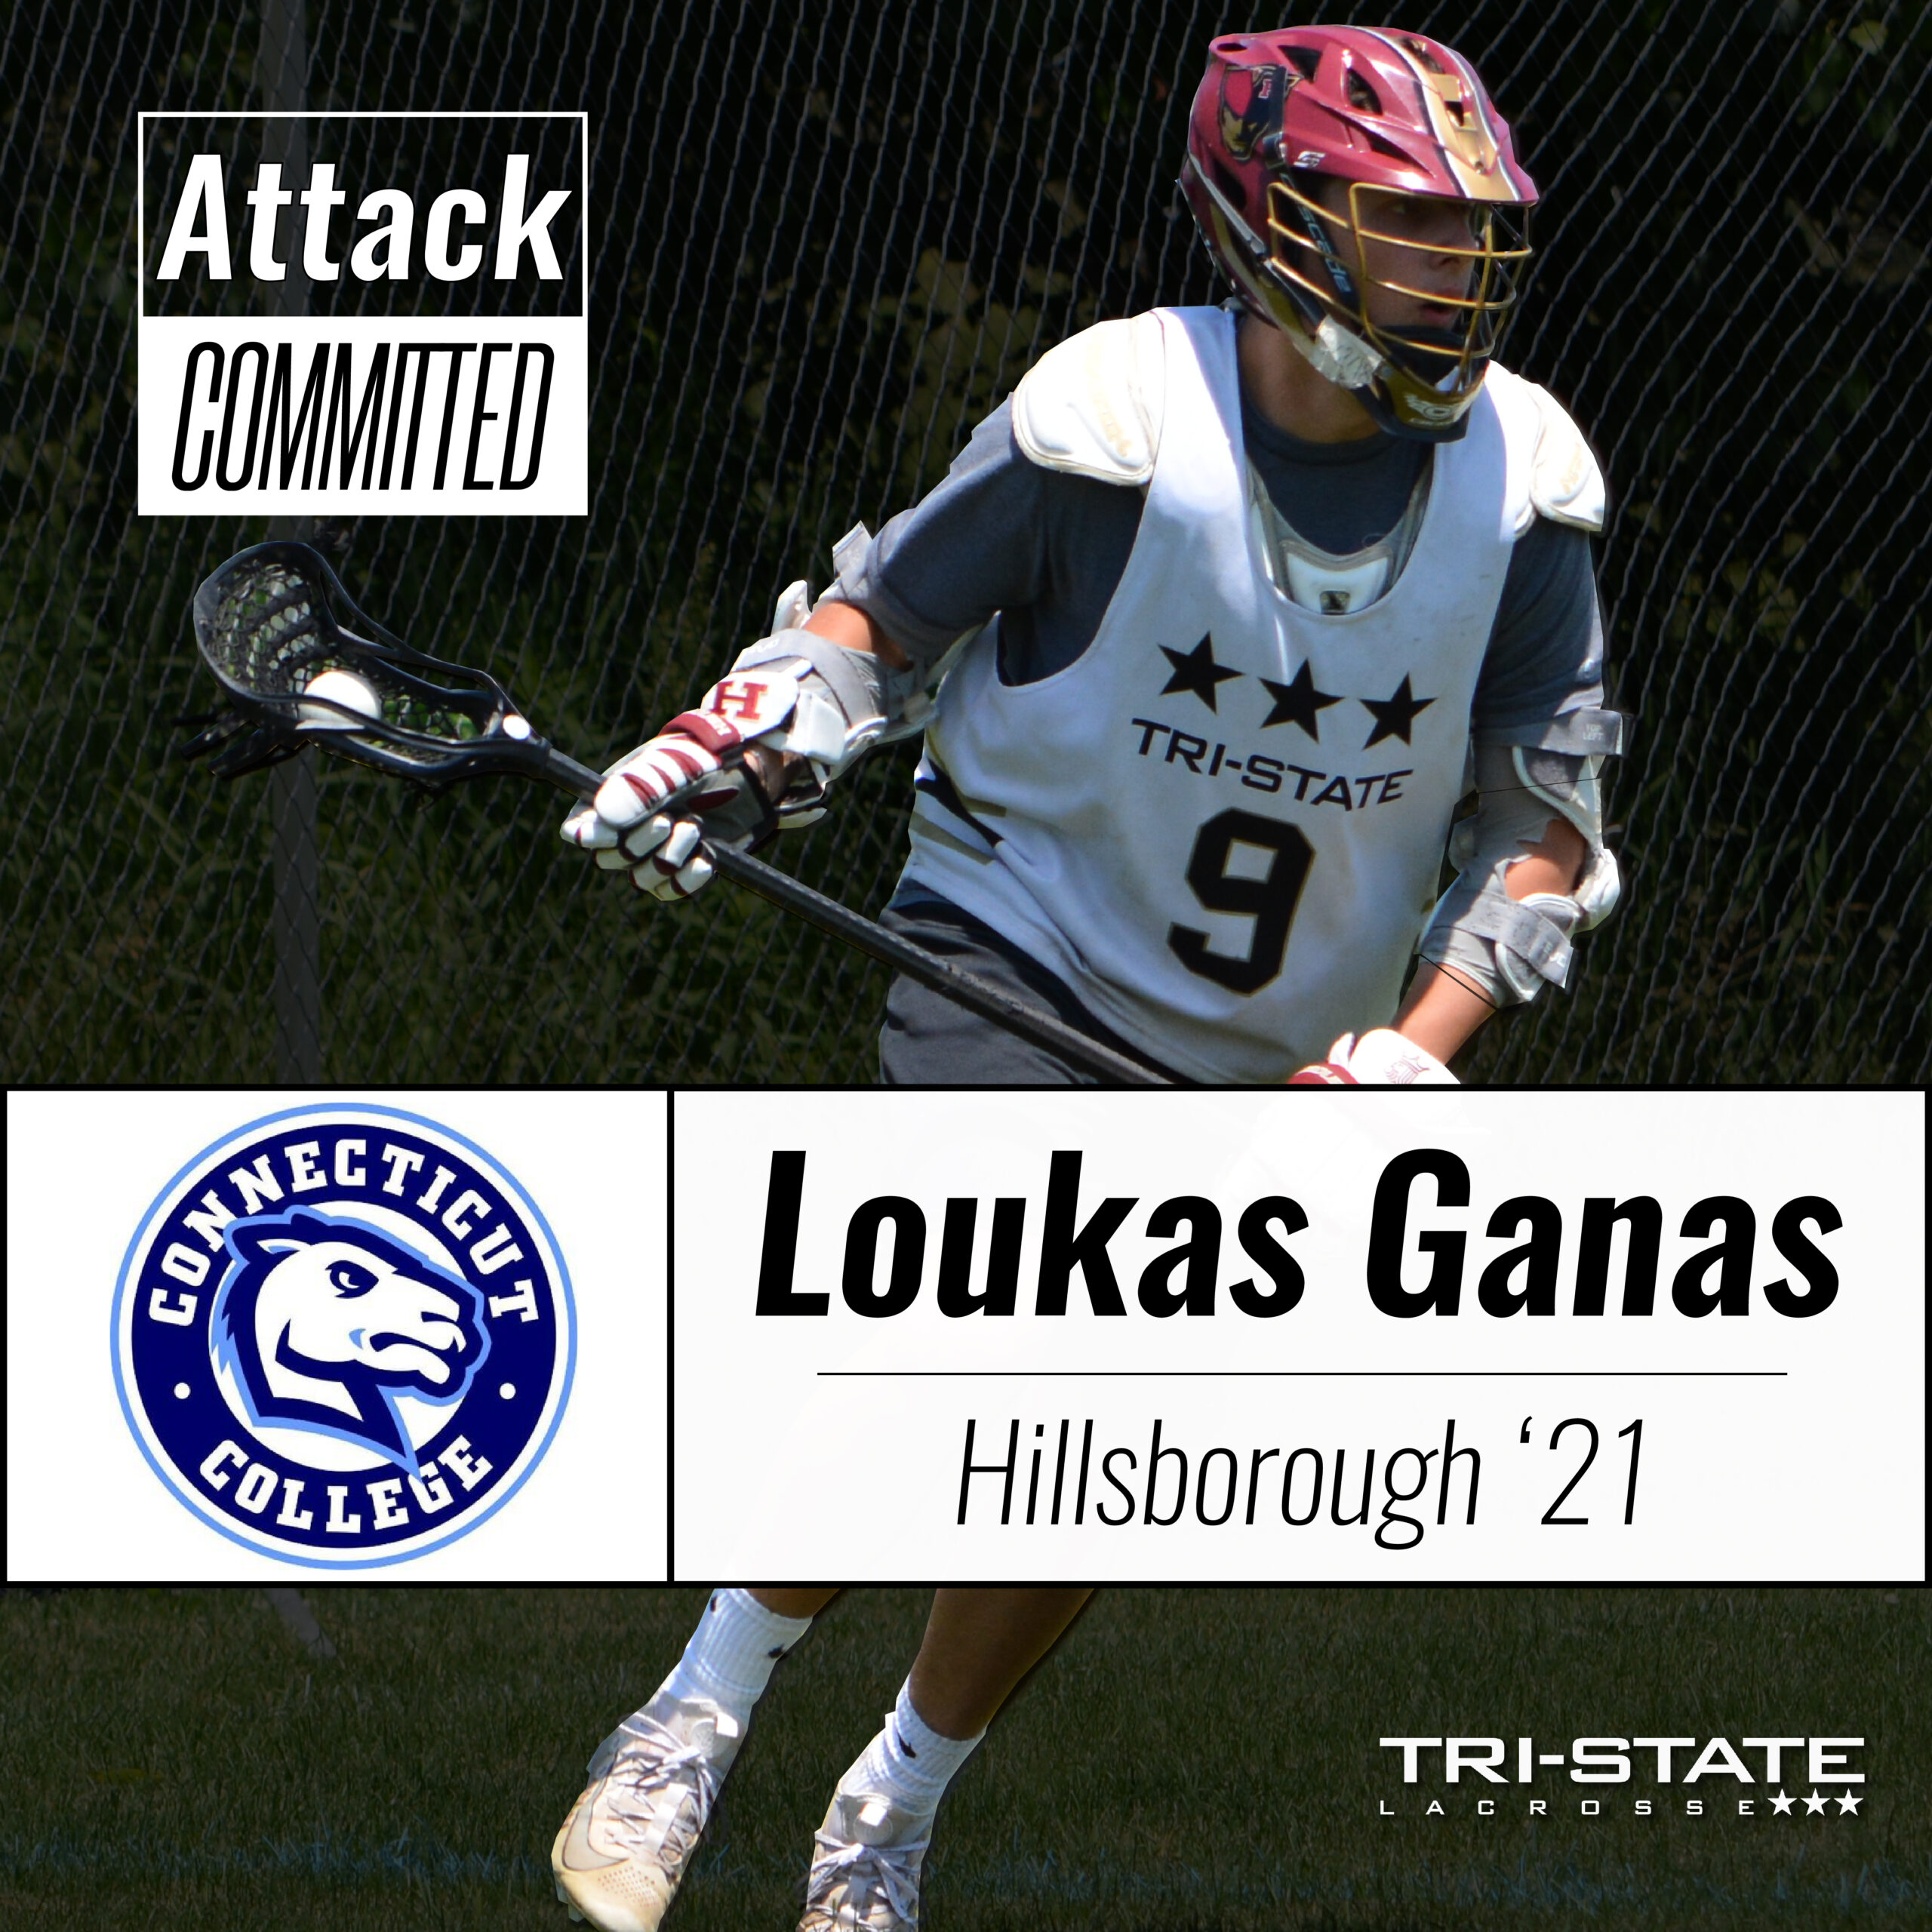 Loukas Ganas, Hillsborough - Connecticut